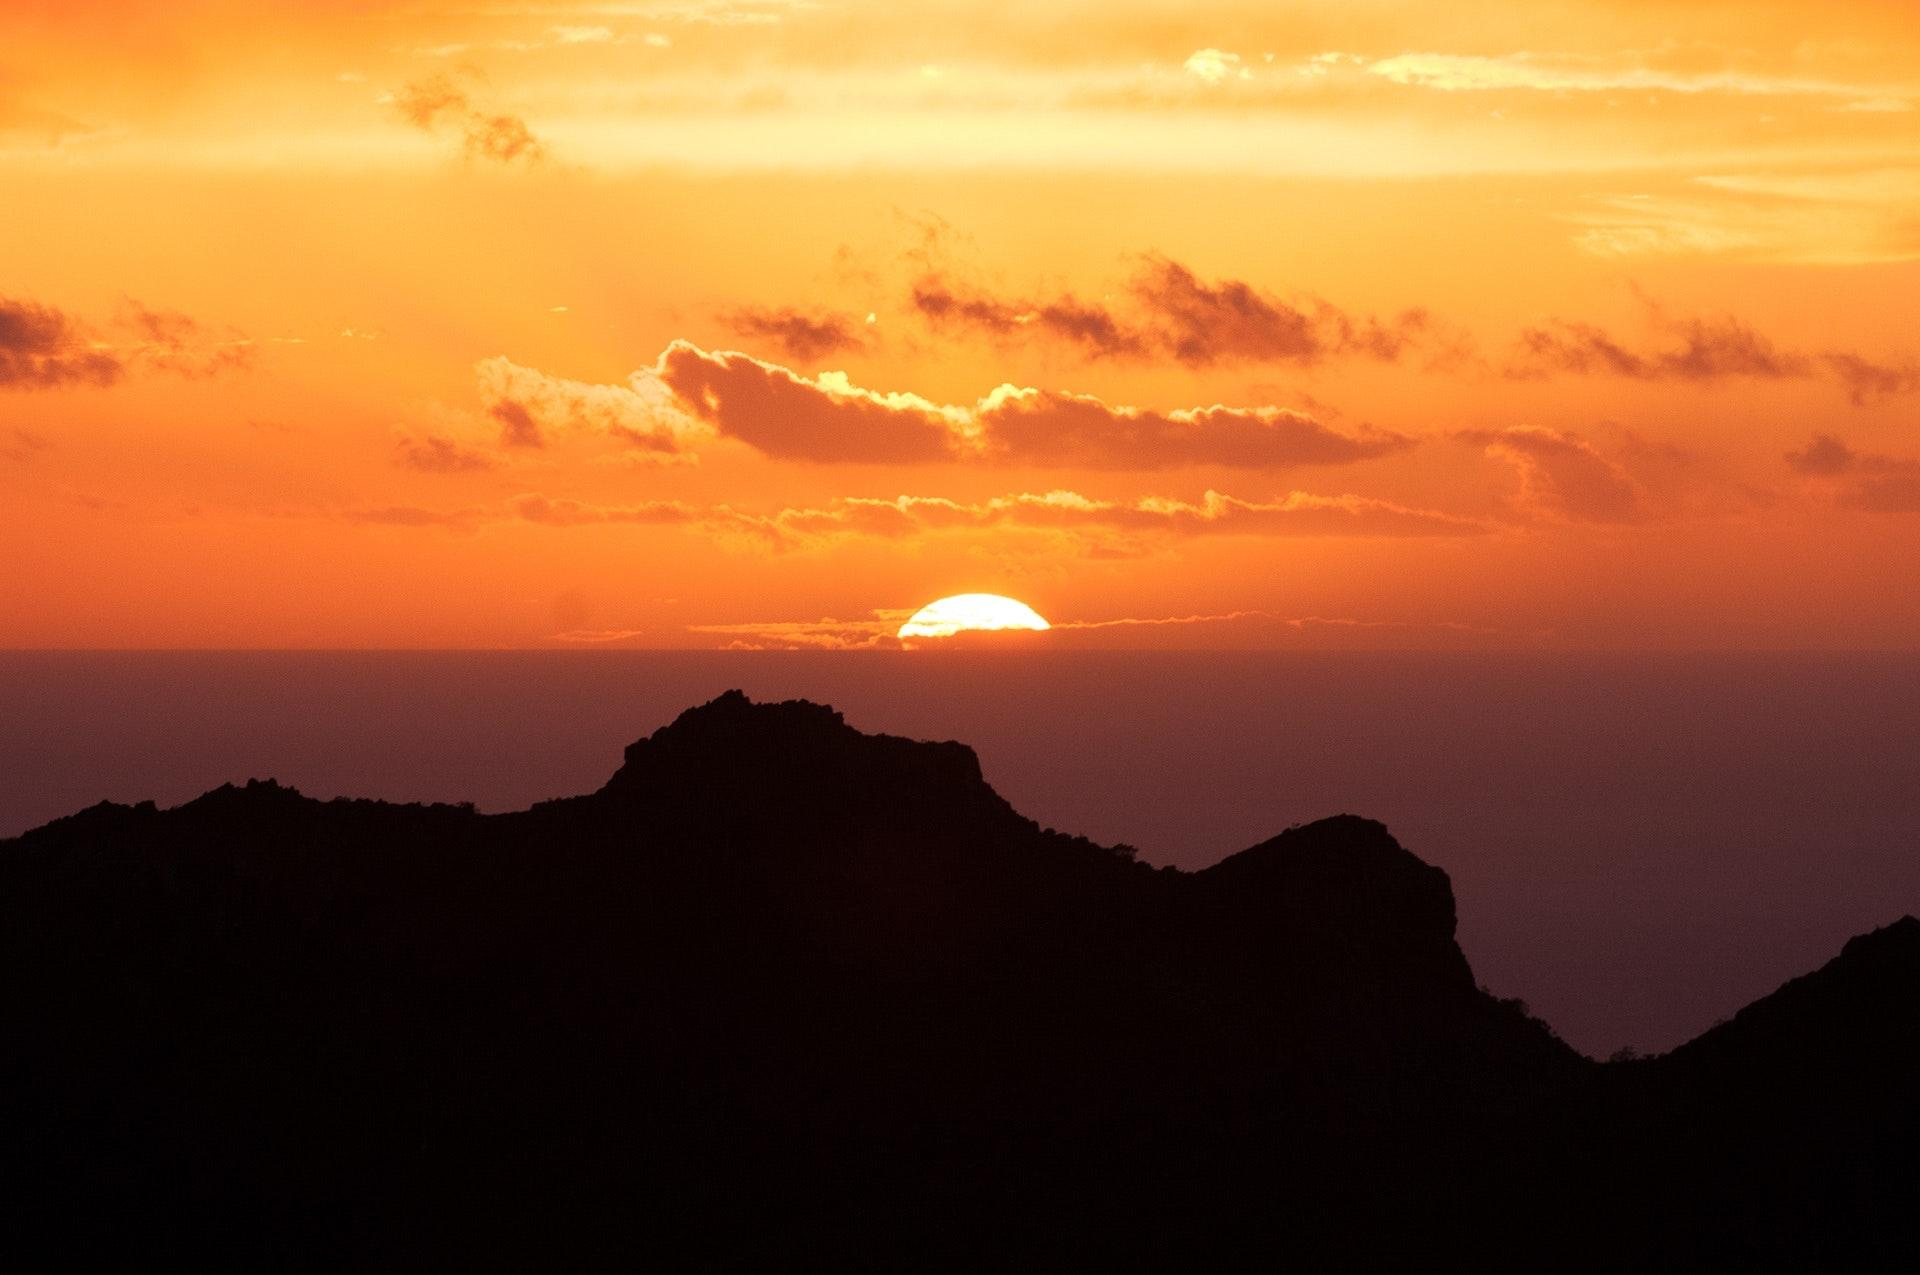 Silhouette of mountain under sunset photo